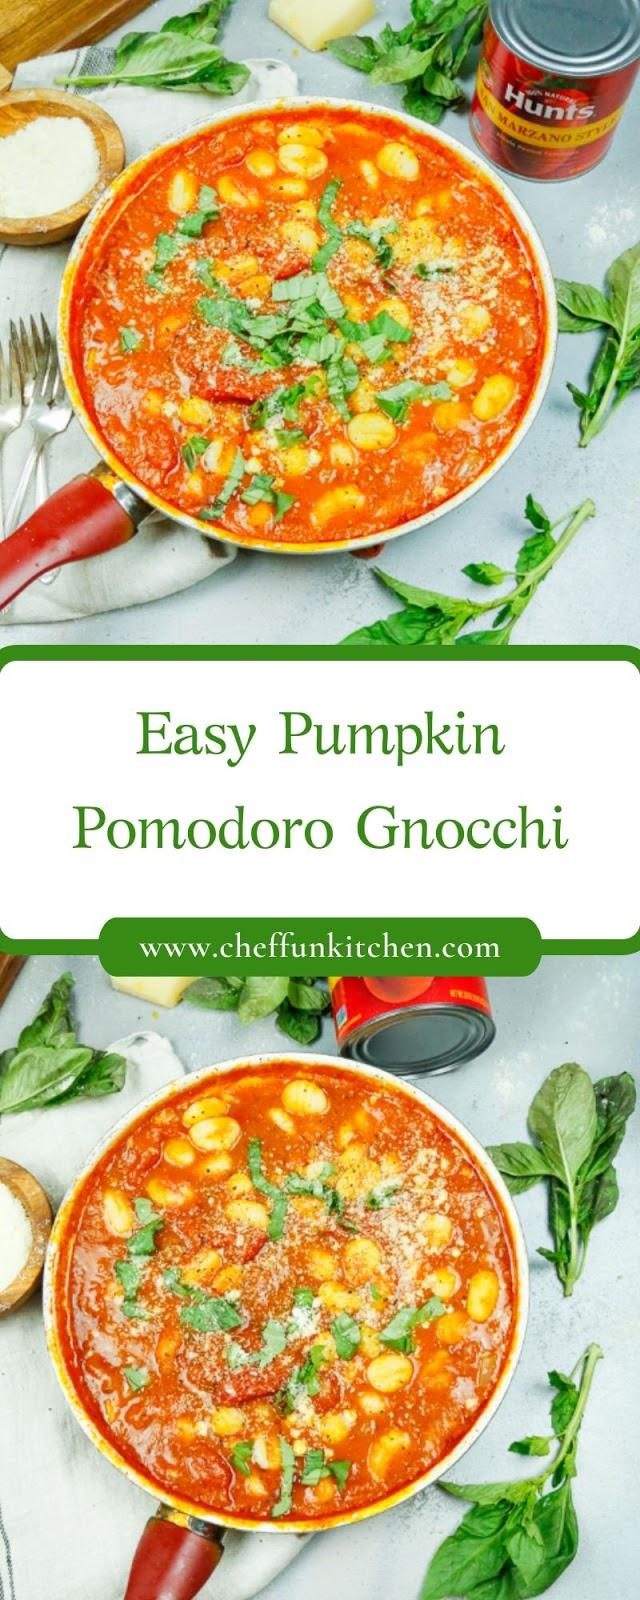 Easy Pumpkin Pomodoro Gnocchi